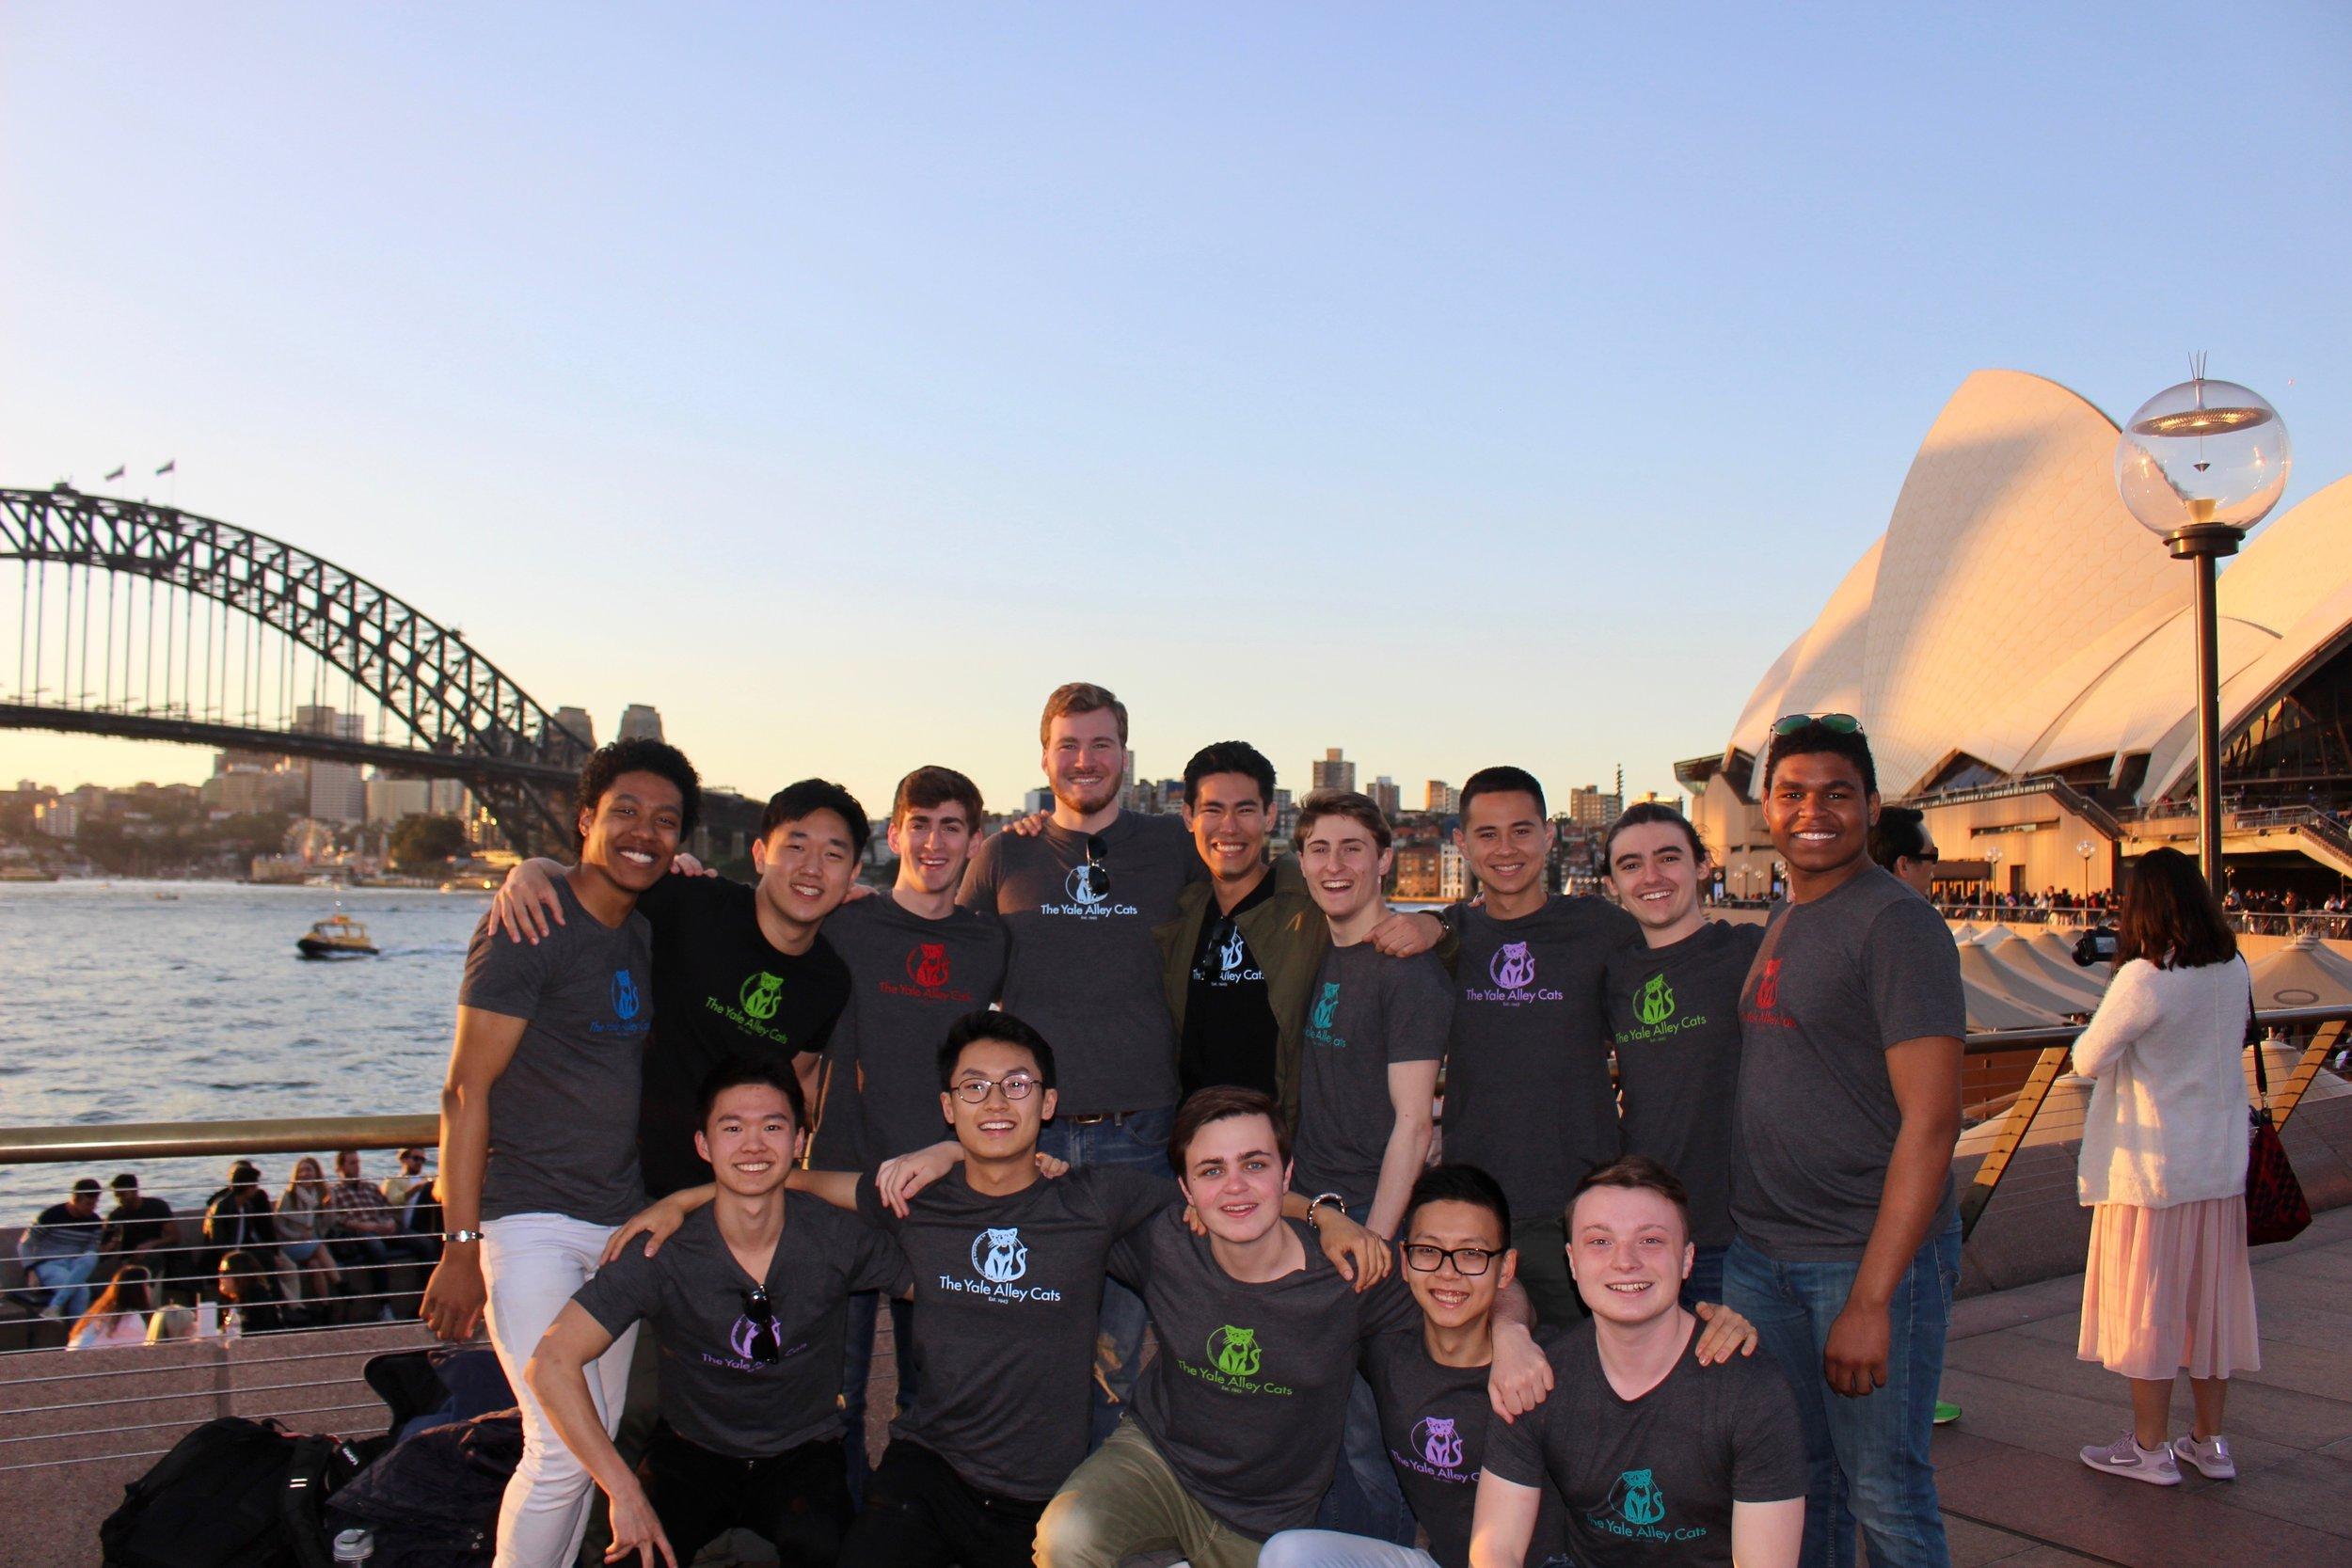 Group photo by the Sydney Opera House and Harbor Bridge